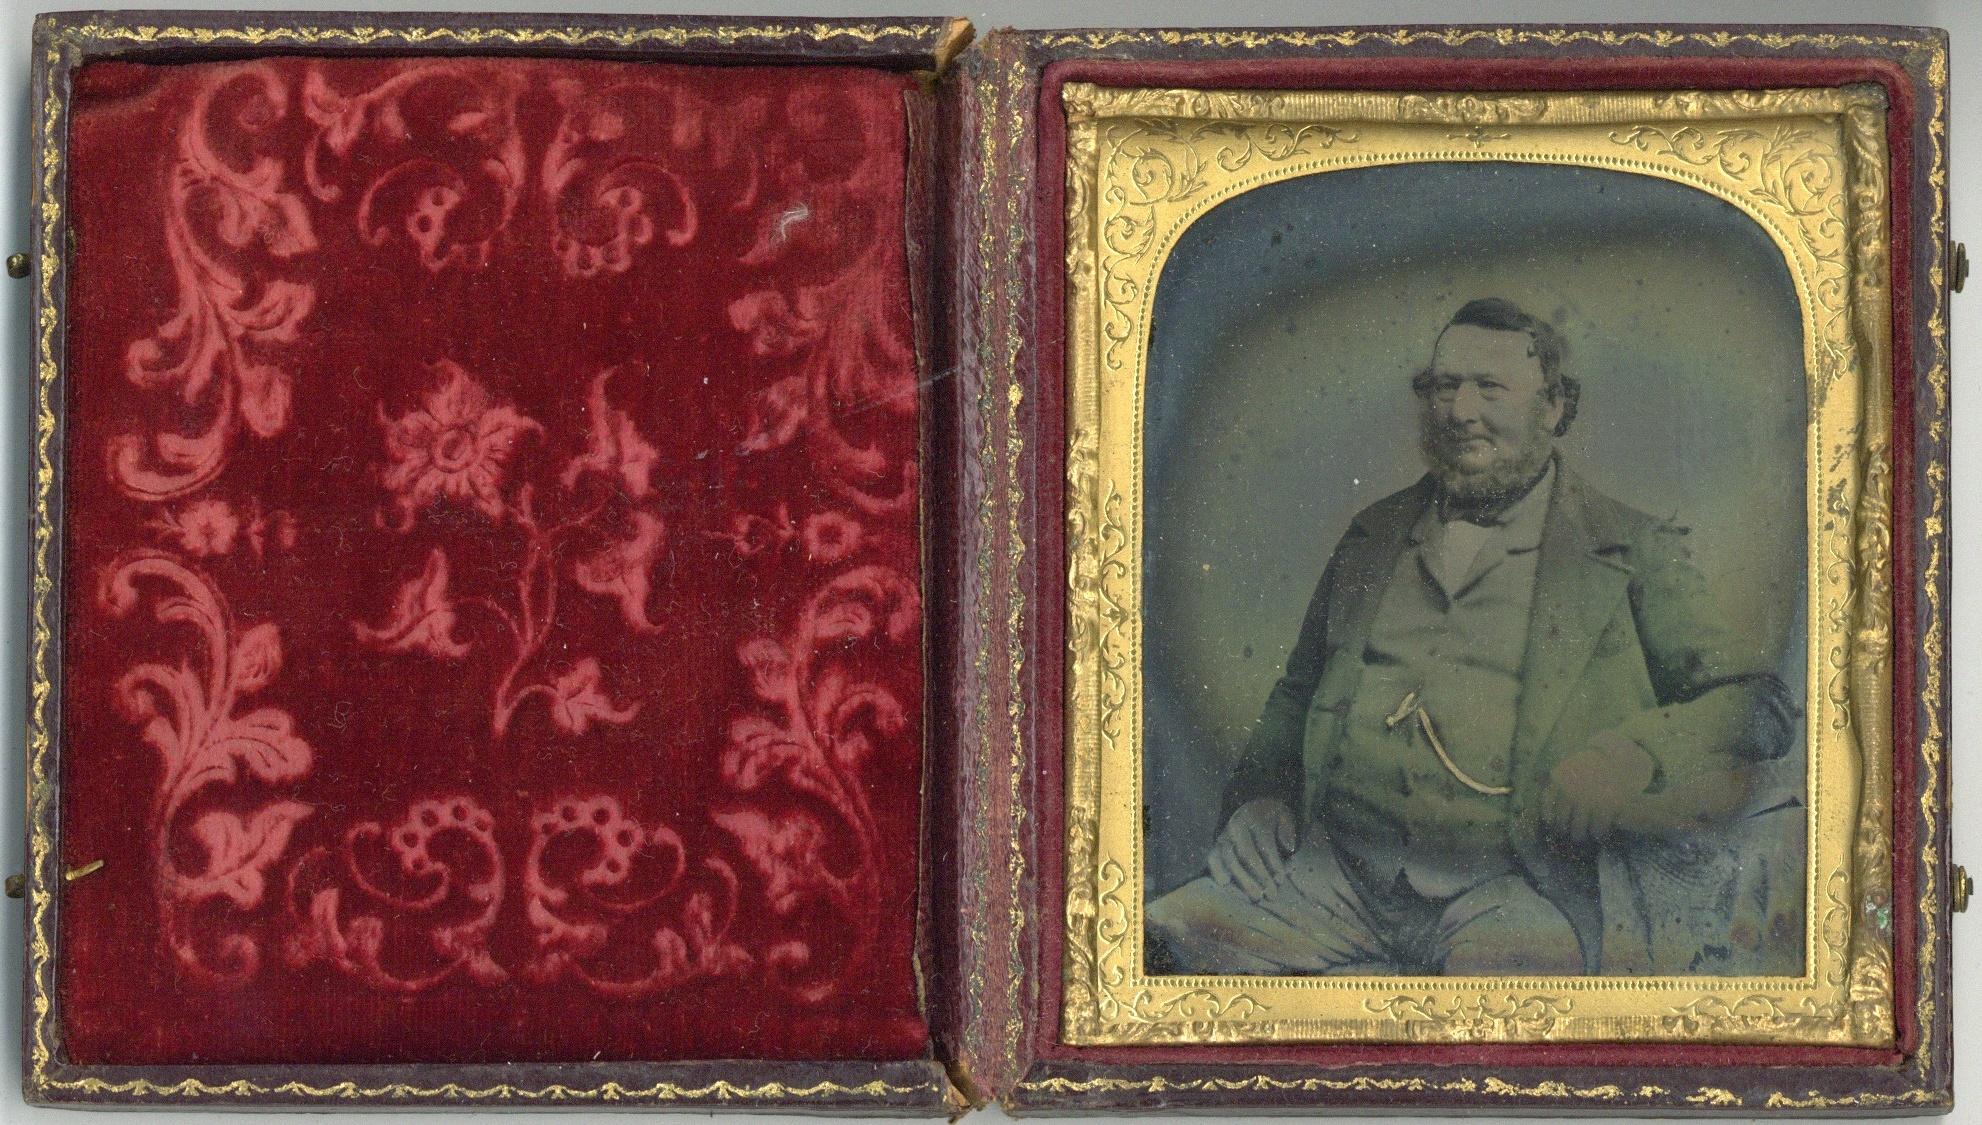 HIRAM CROMPTON BOOTH (1825-1890), An Opalotype Photograph, - Image 5 of 7